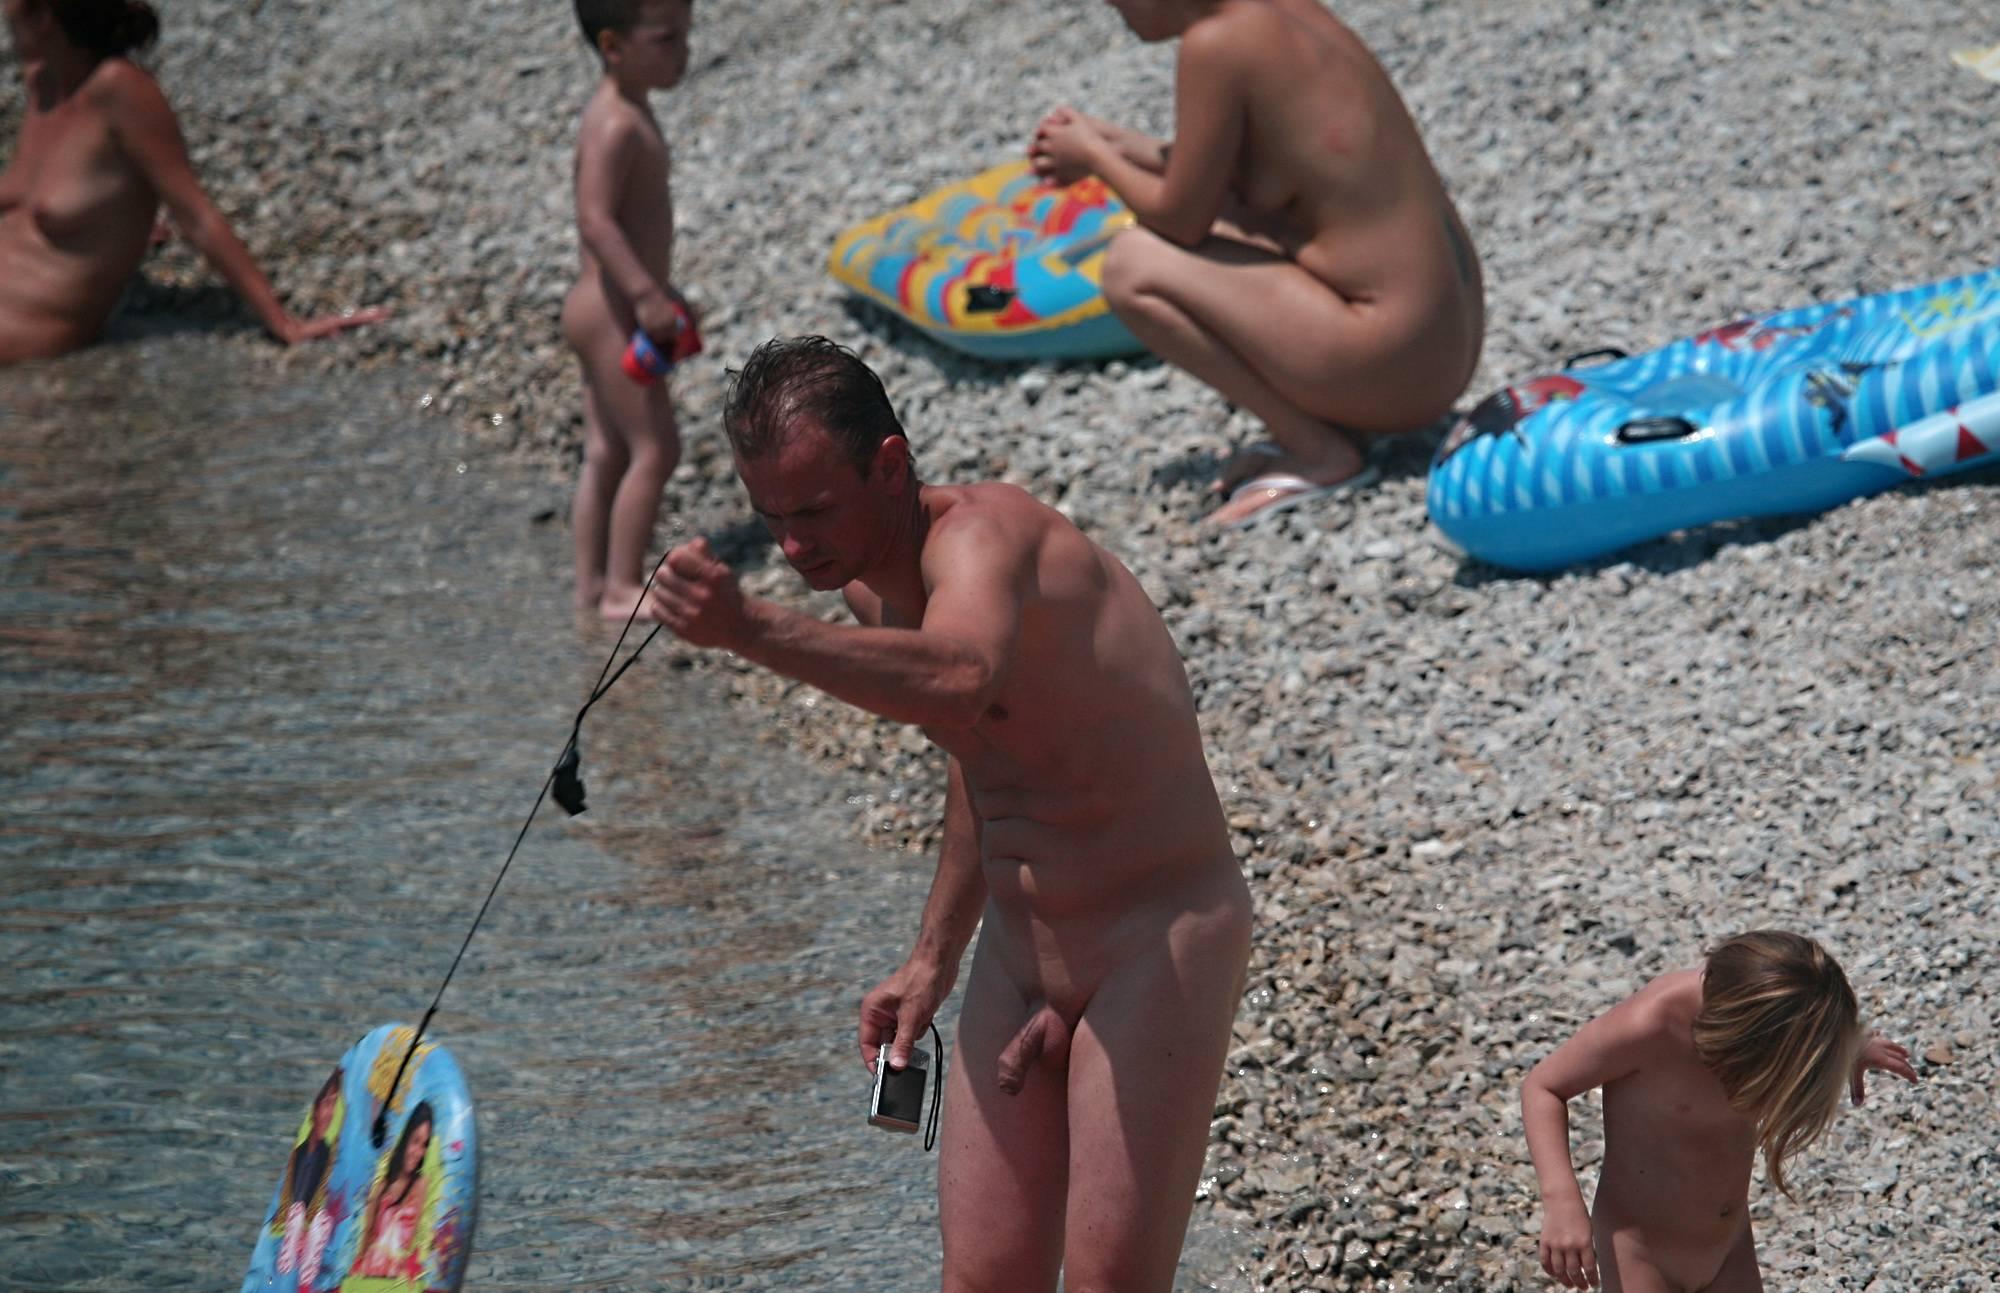 Nudist Gallery Babysitting Kids on Shore - 2